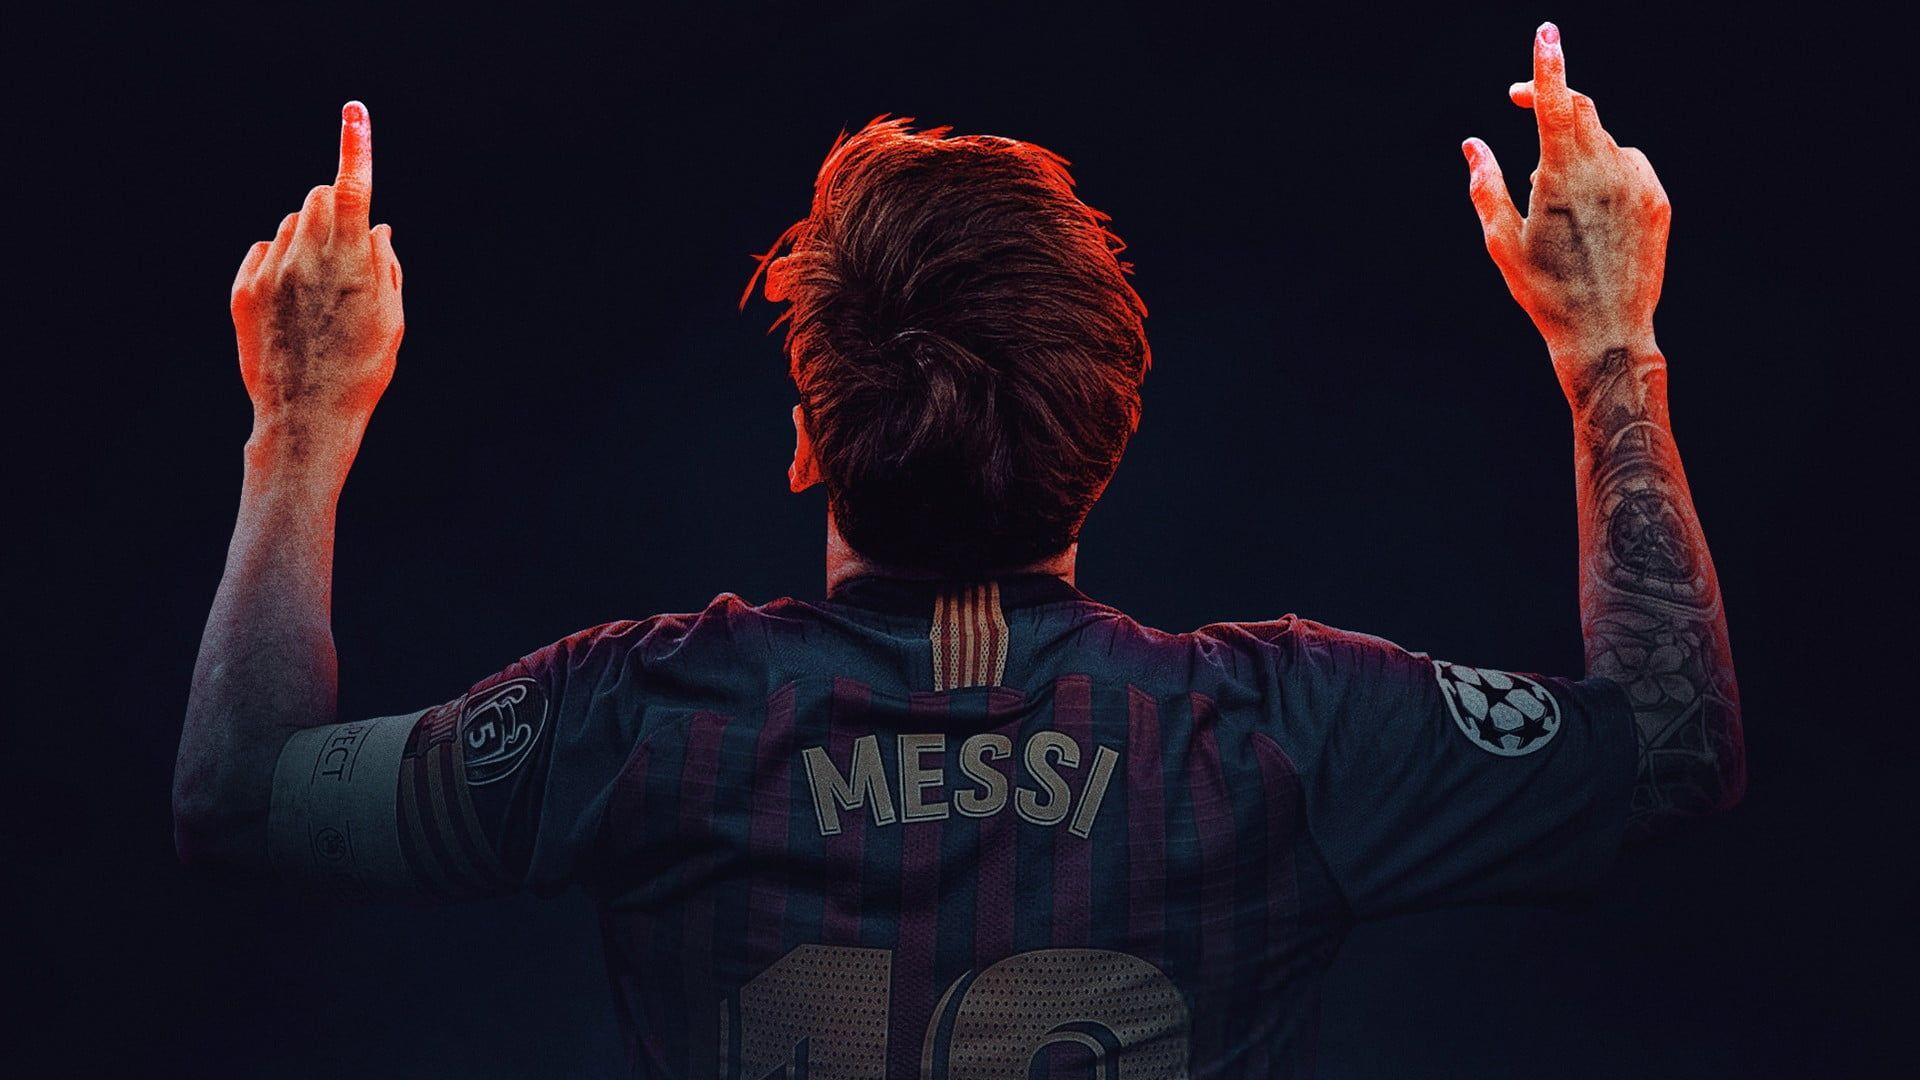 Lionel Messi Football Barcelona 1080p Wallpaper Hdwallpaper Desktop In 2020 Lionel Messi Messi Lionel Messi Wallpapers